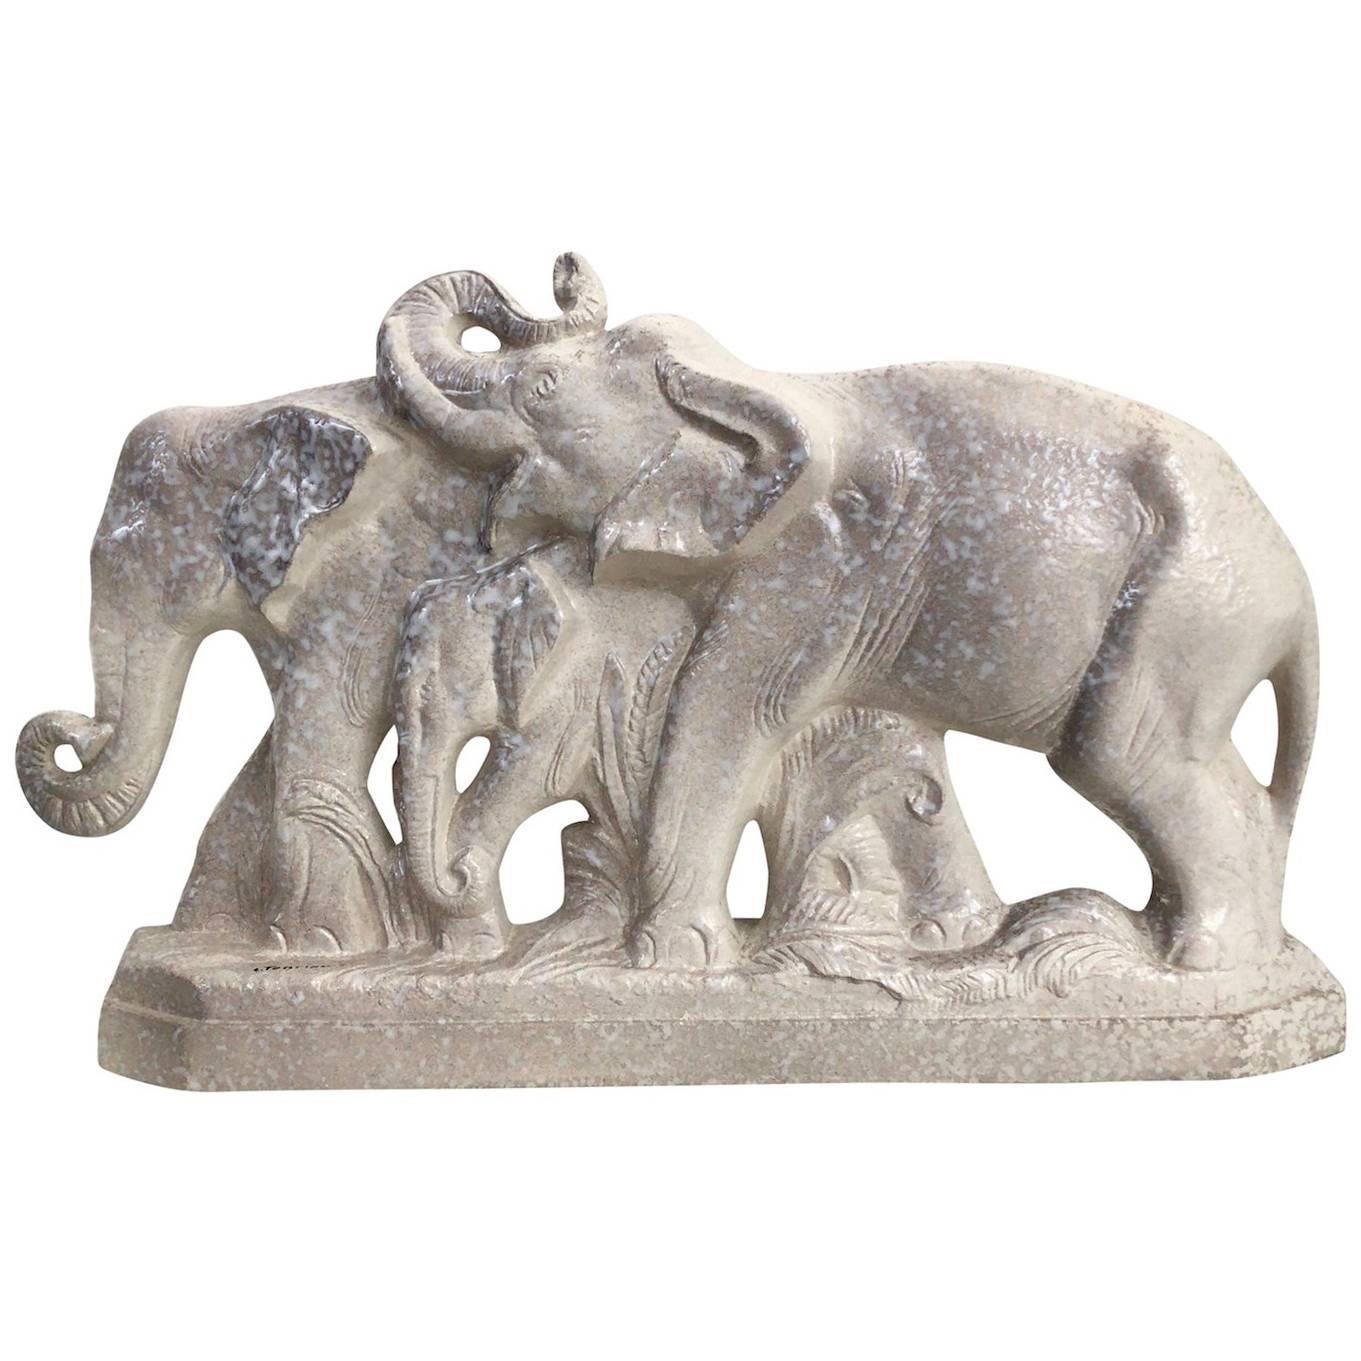 Louis Fontinelle, Cream Glazed Ceramic Elephants, France, 1930s